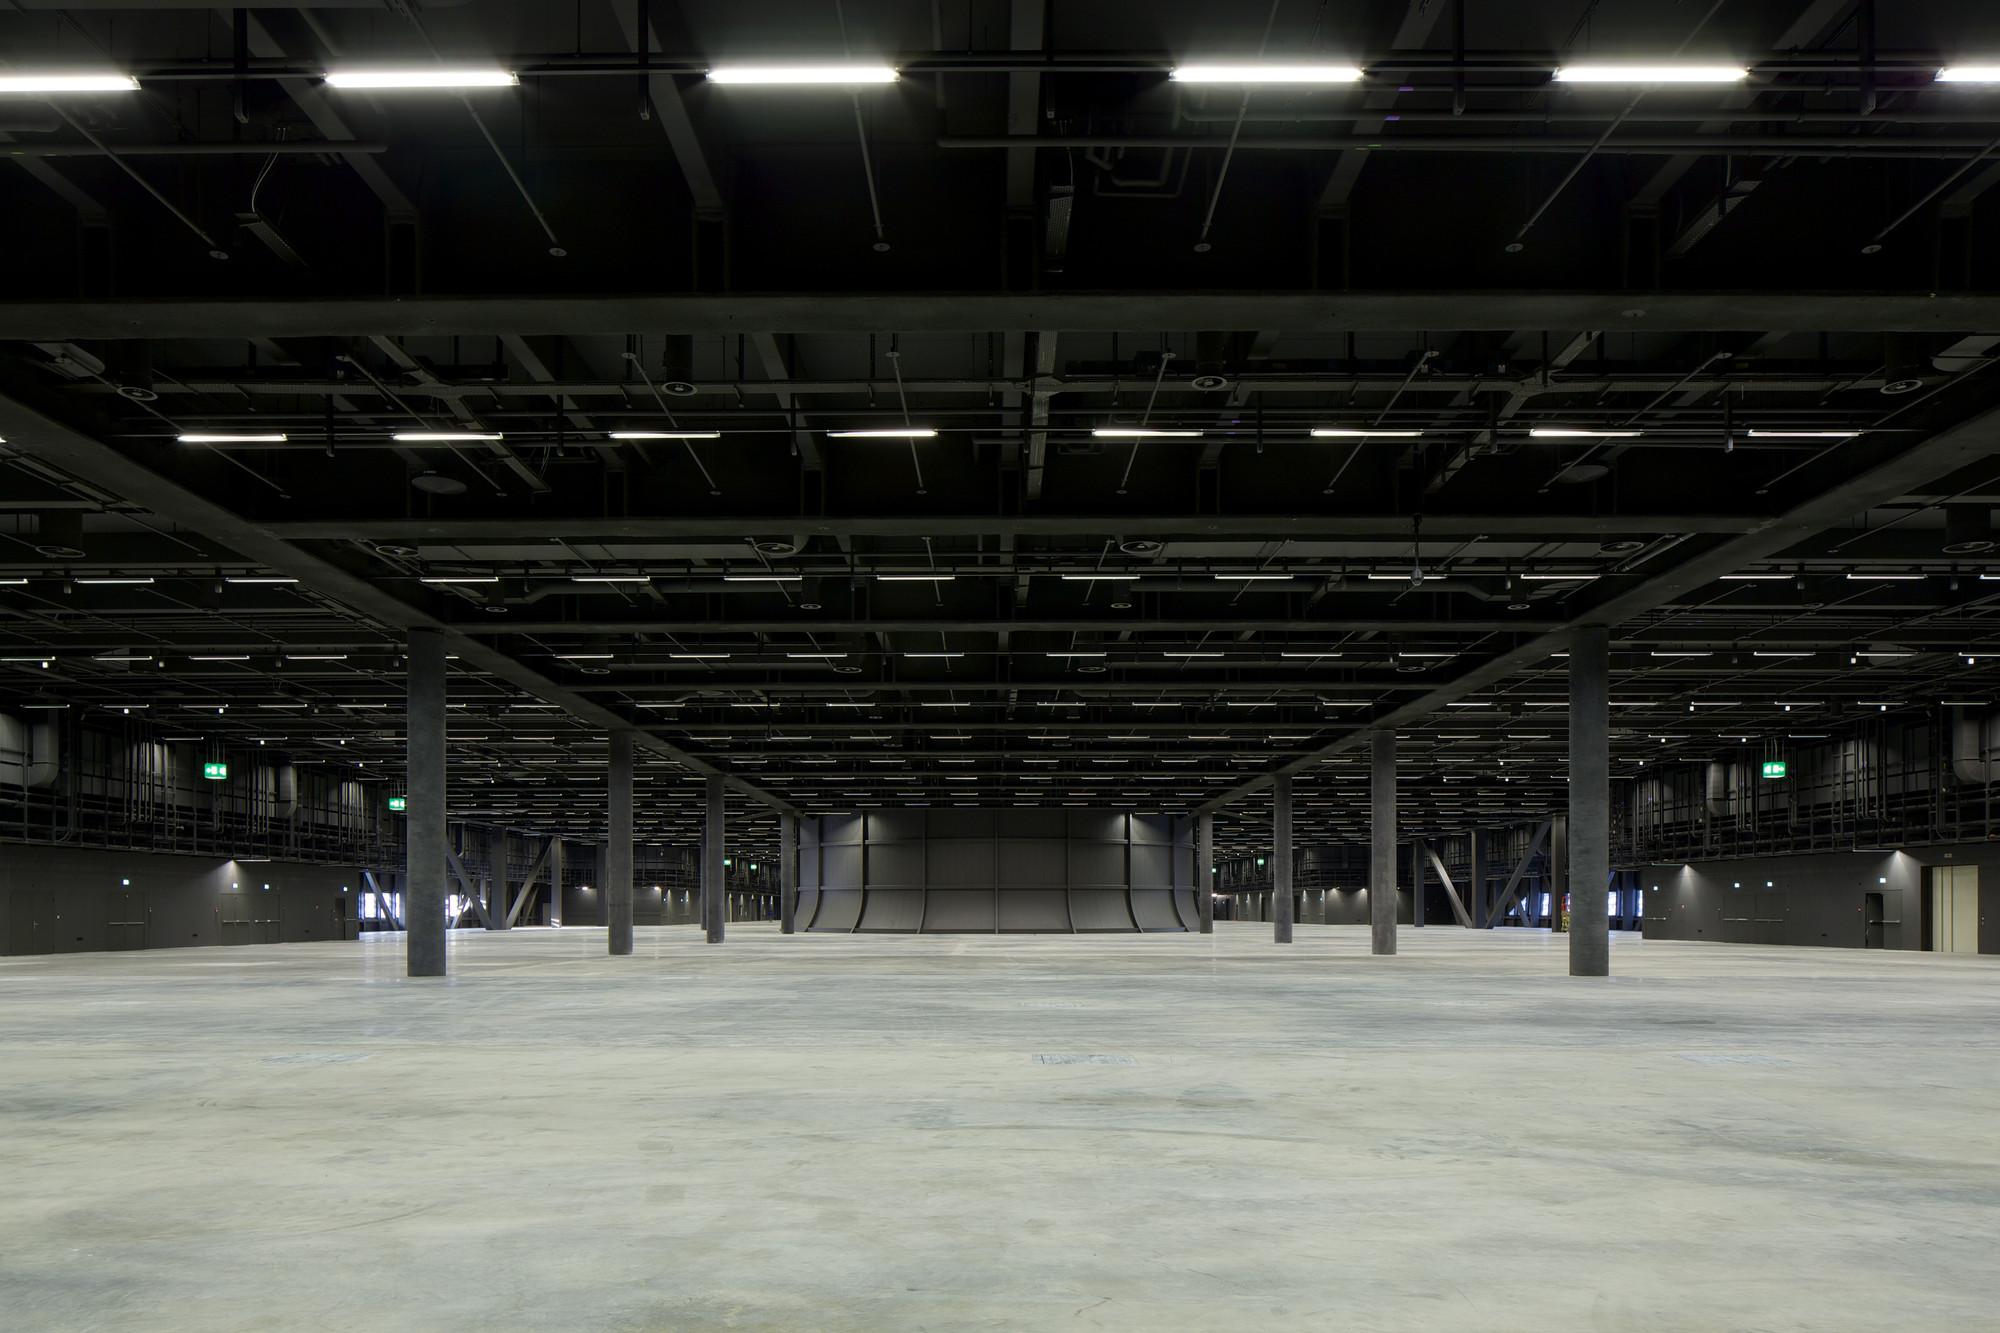 Messe Basel New Hall / Herzog & de Meuron